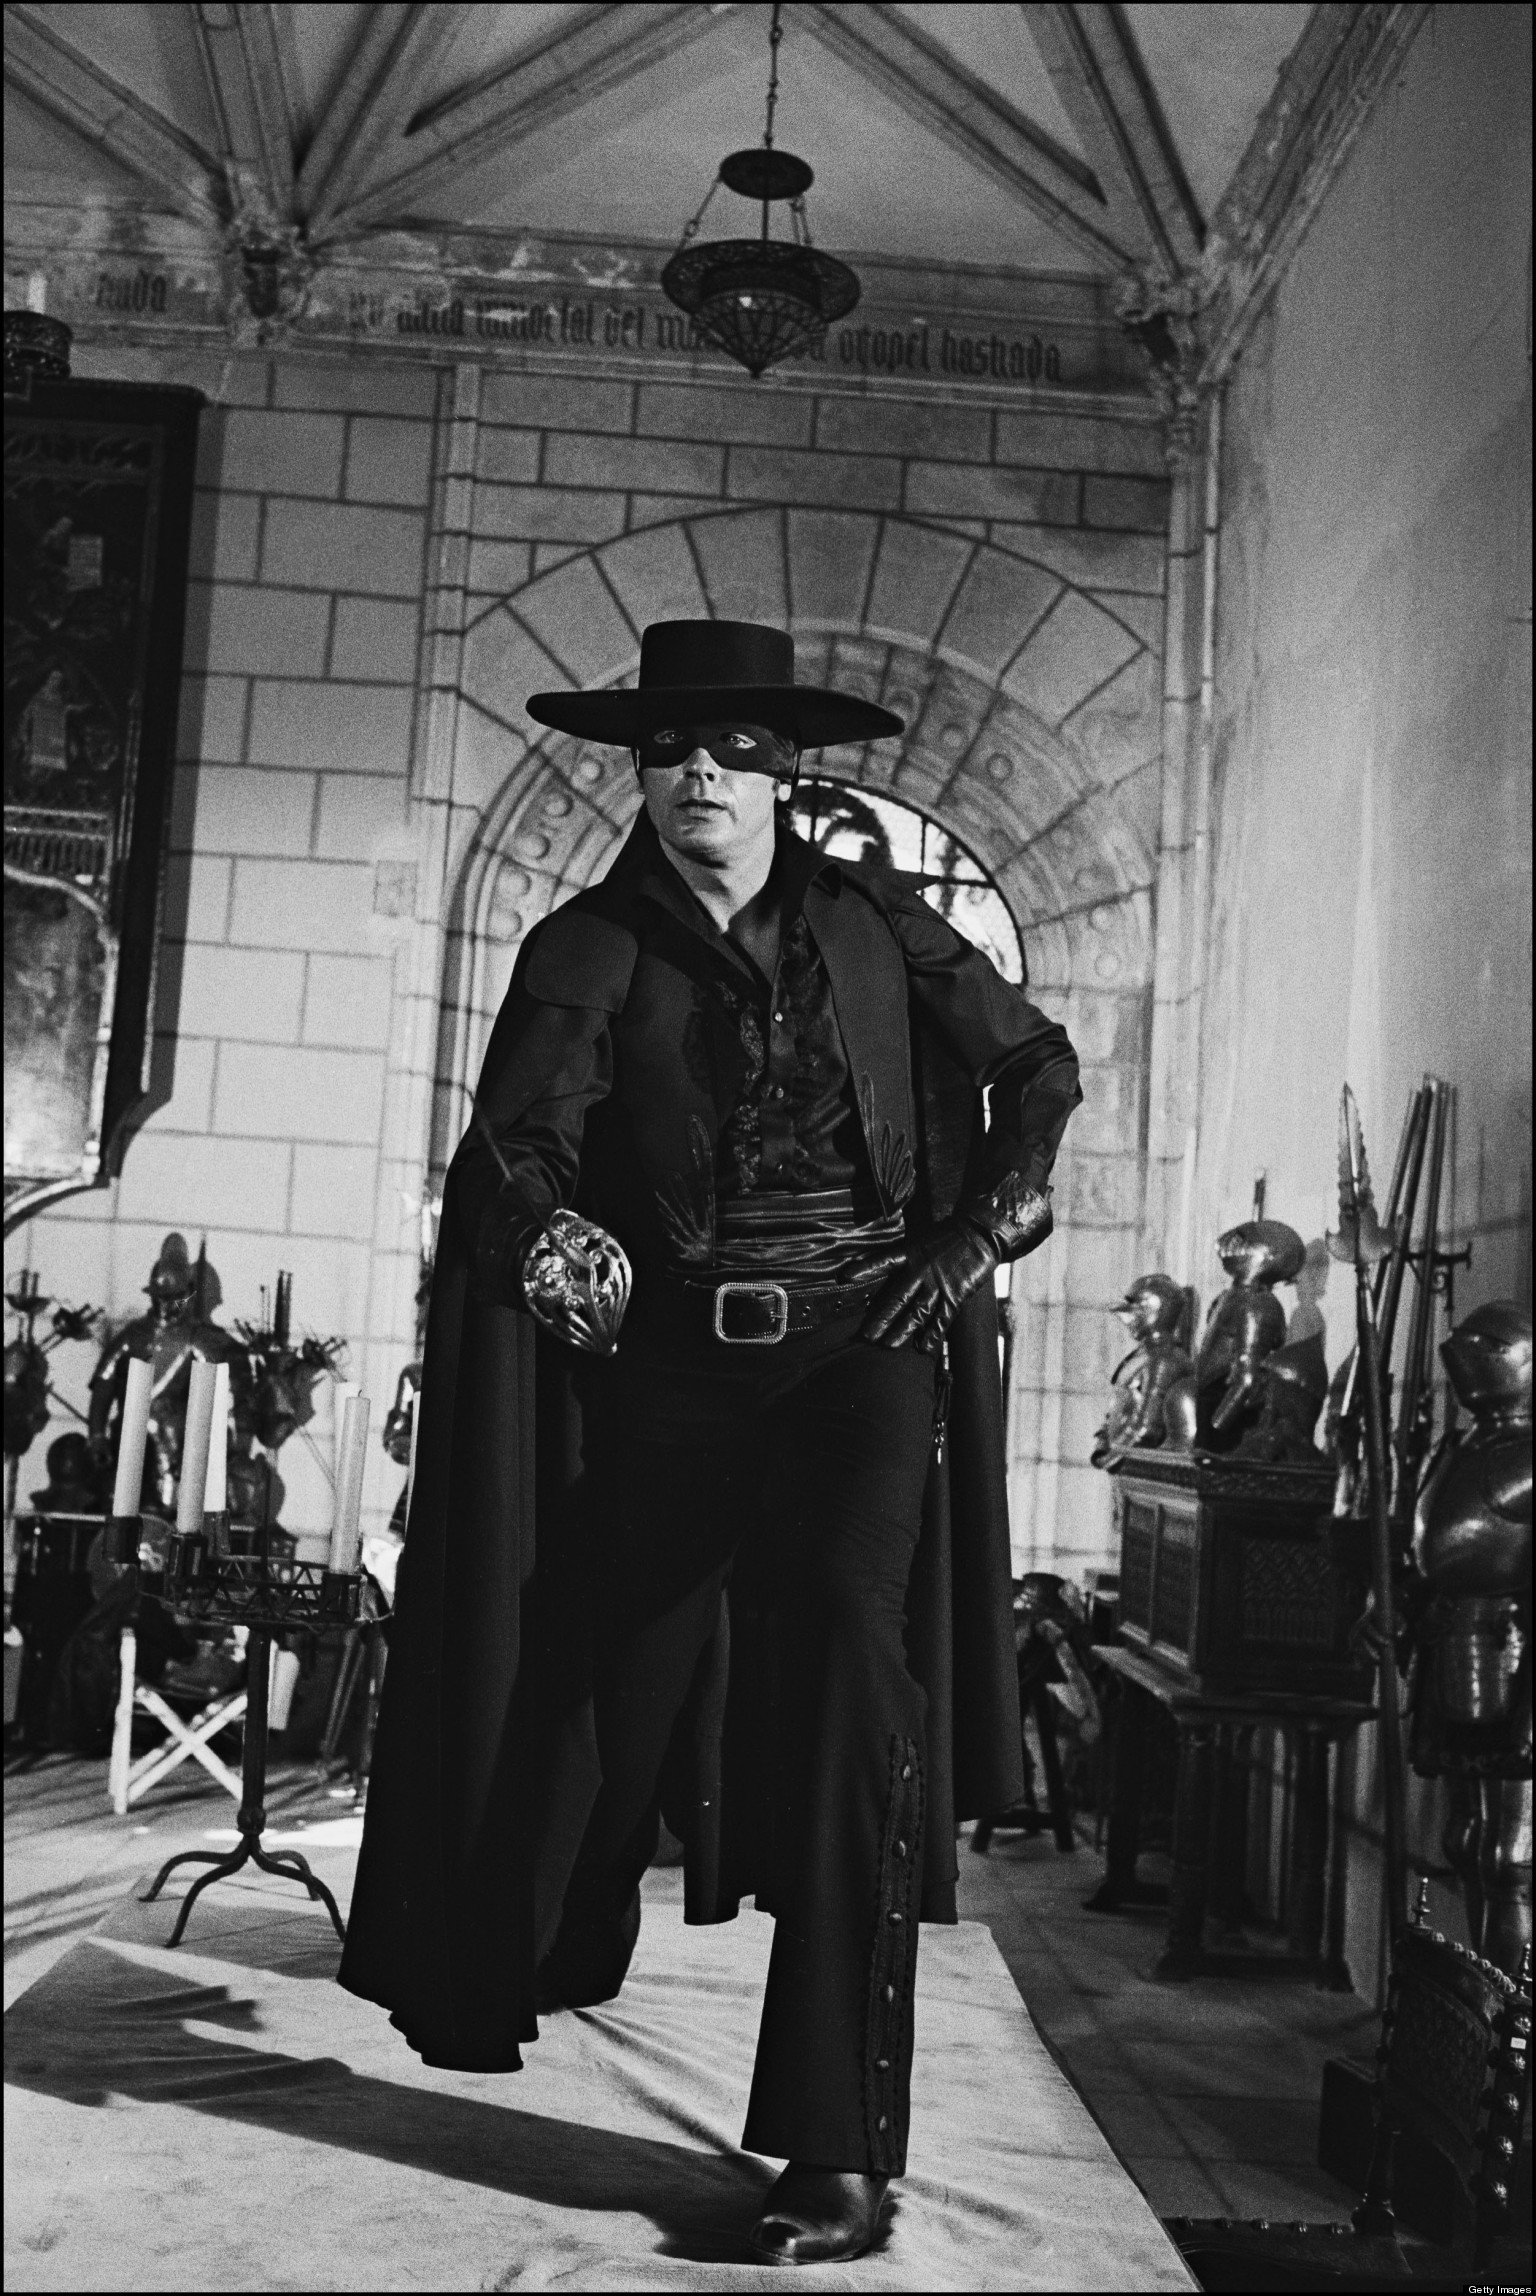 Zorro (série télévisée, 1957) — Wikipédia